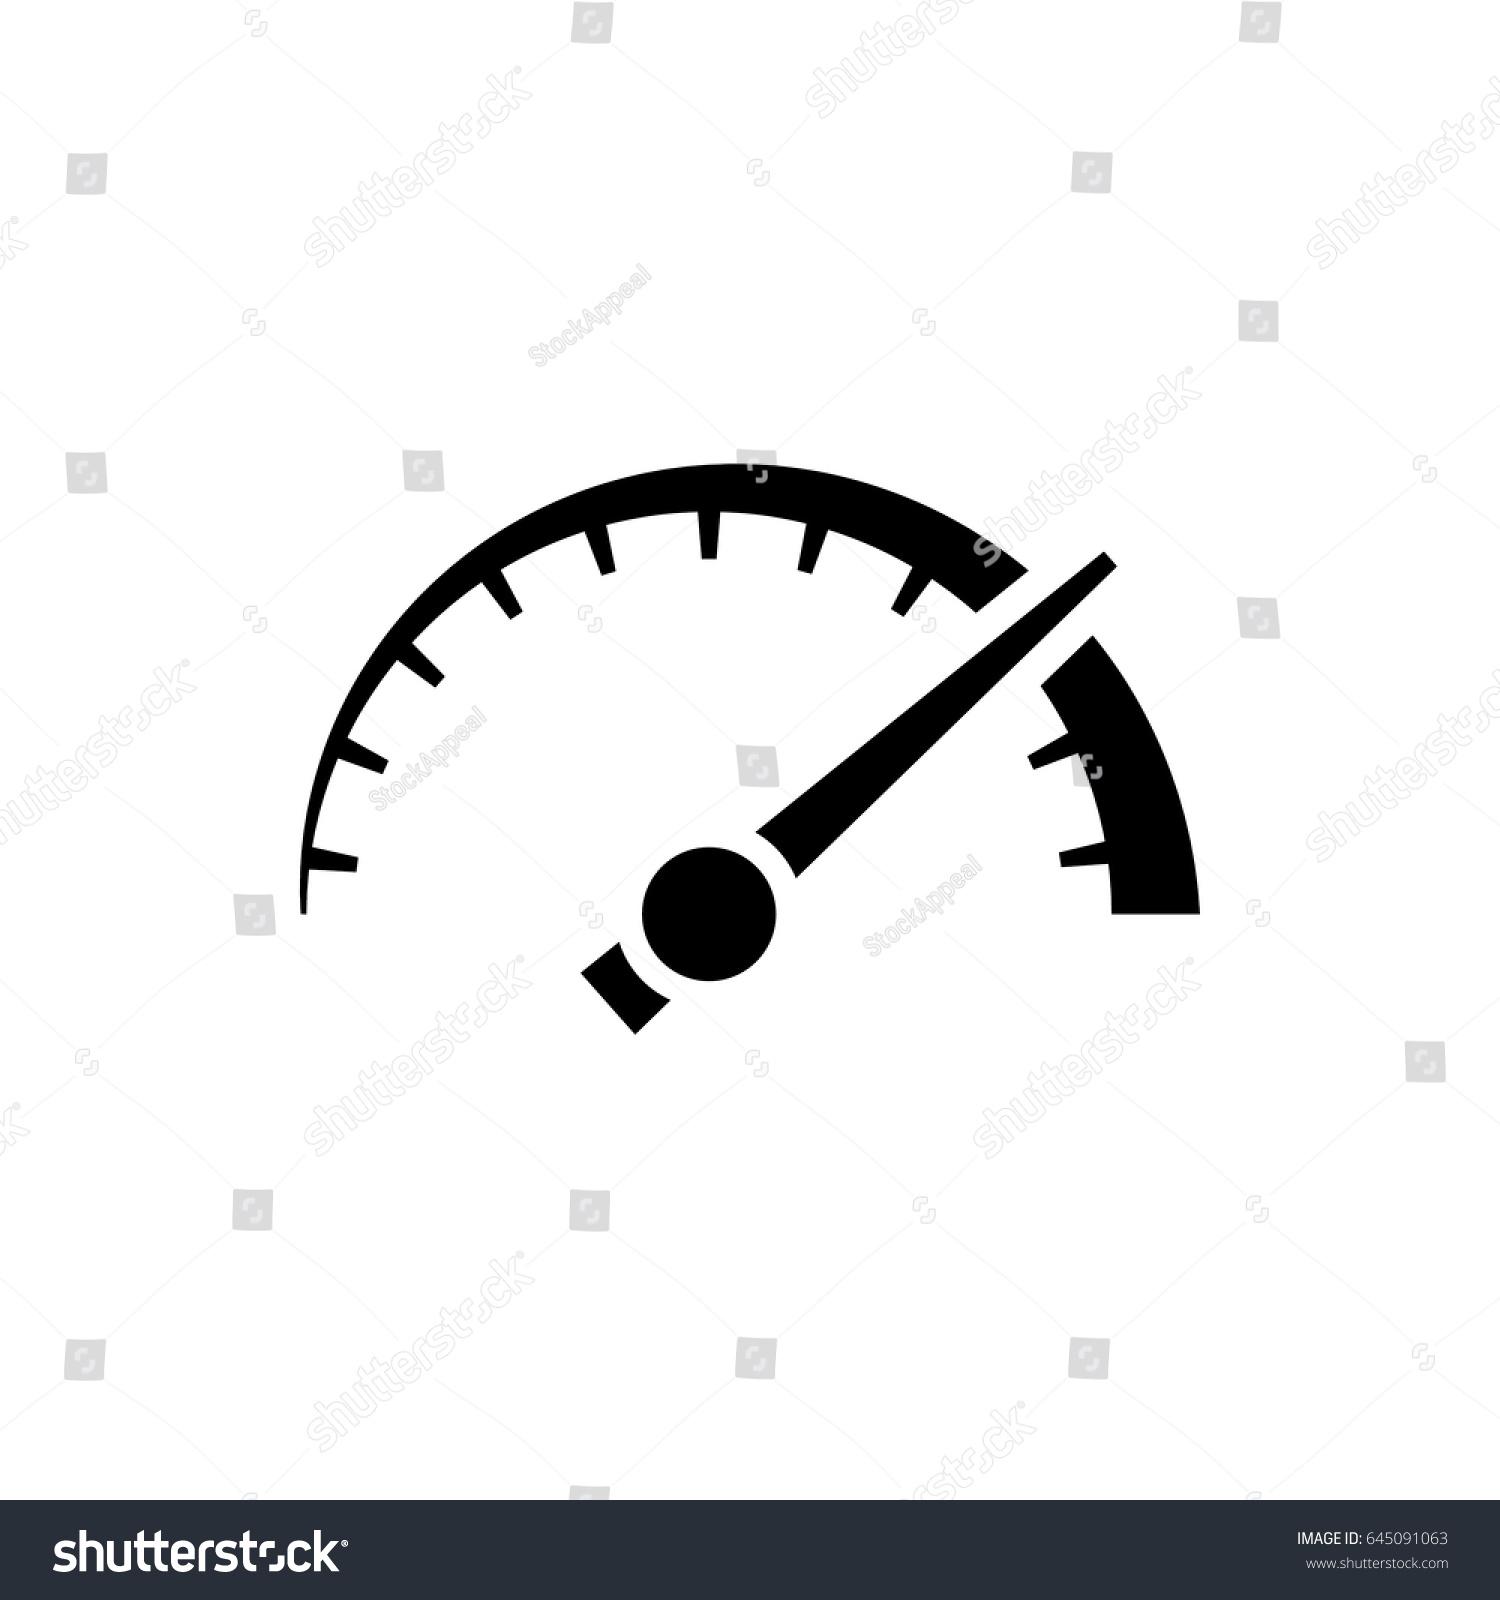 vector speedometer odometer icon thick black stock vector 2018 rh shutterstock com speedometer vector free download speedometer vector free download